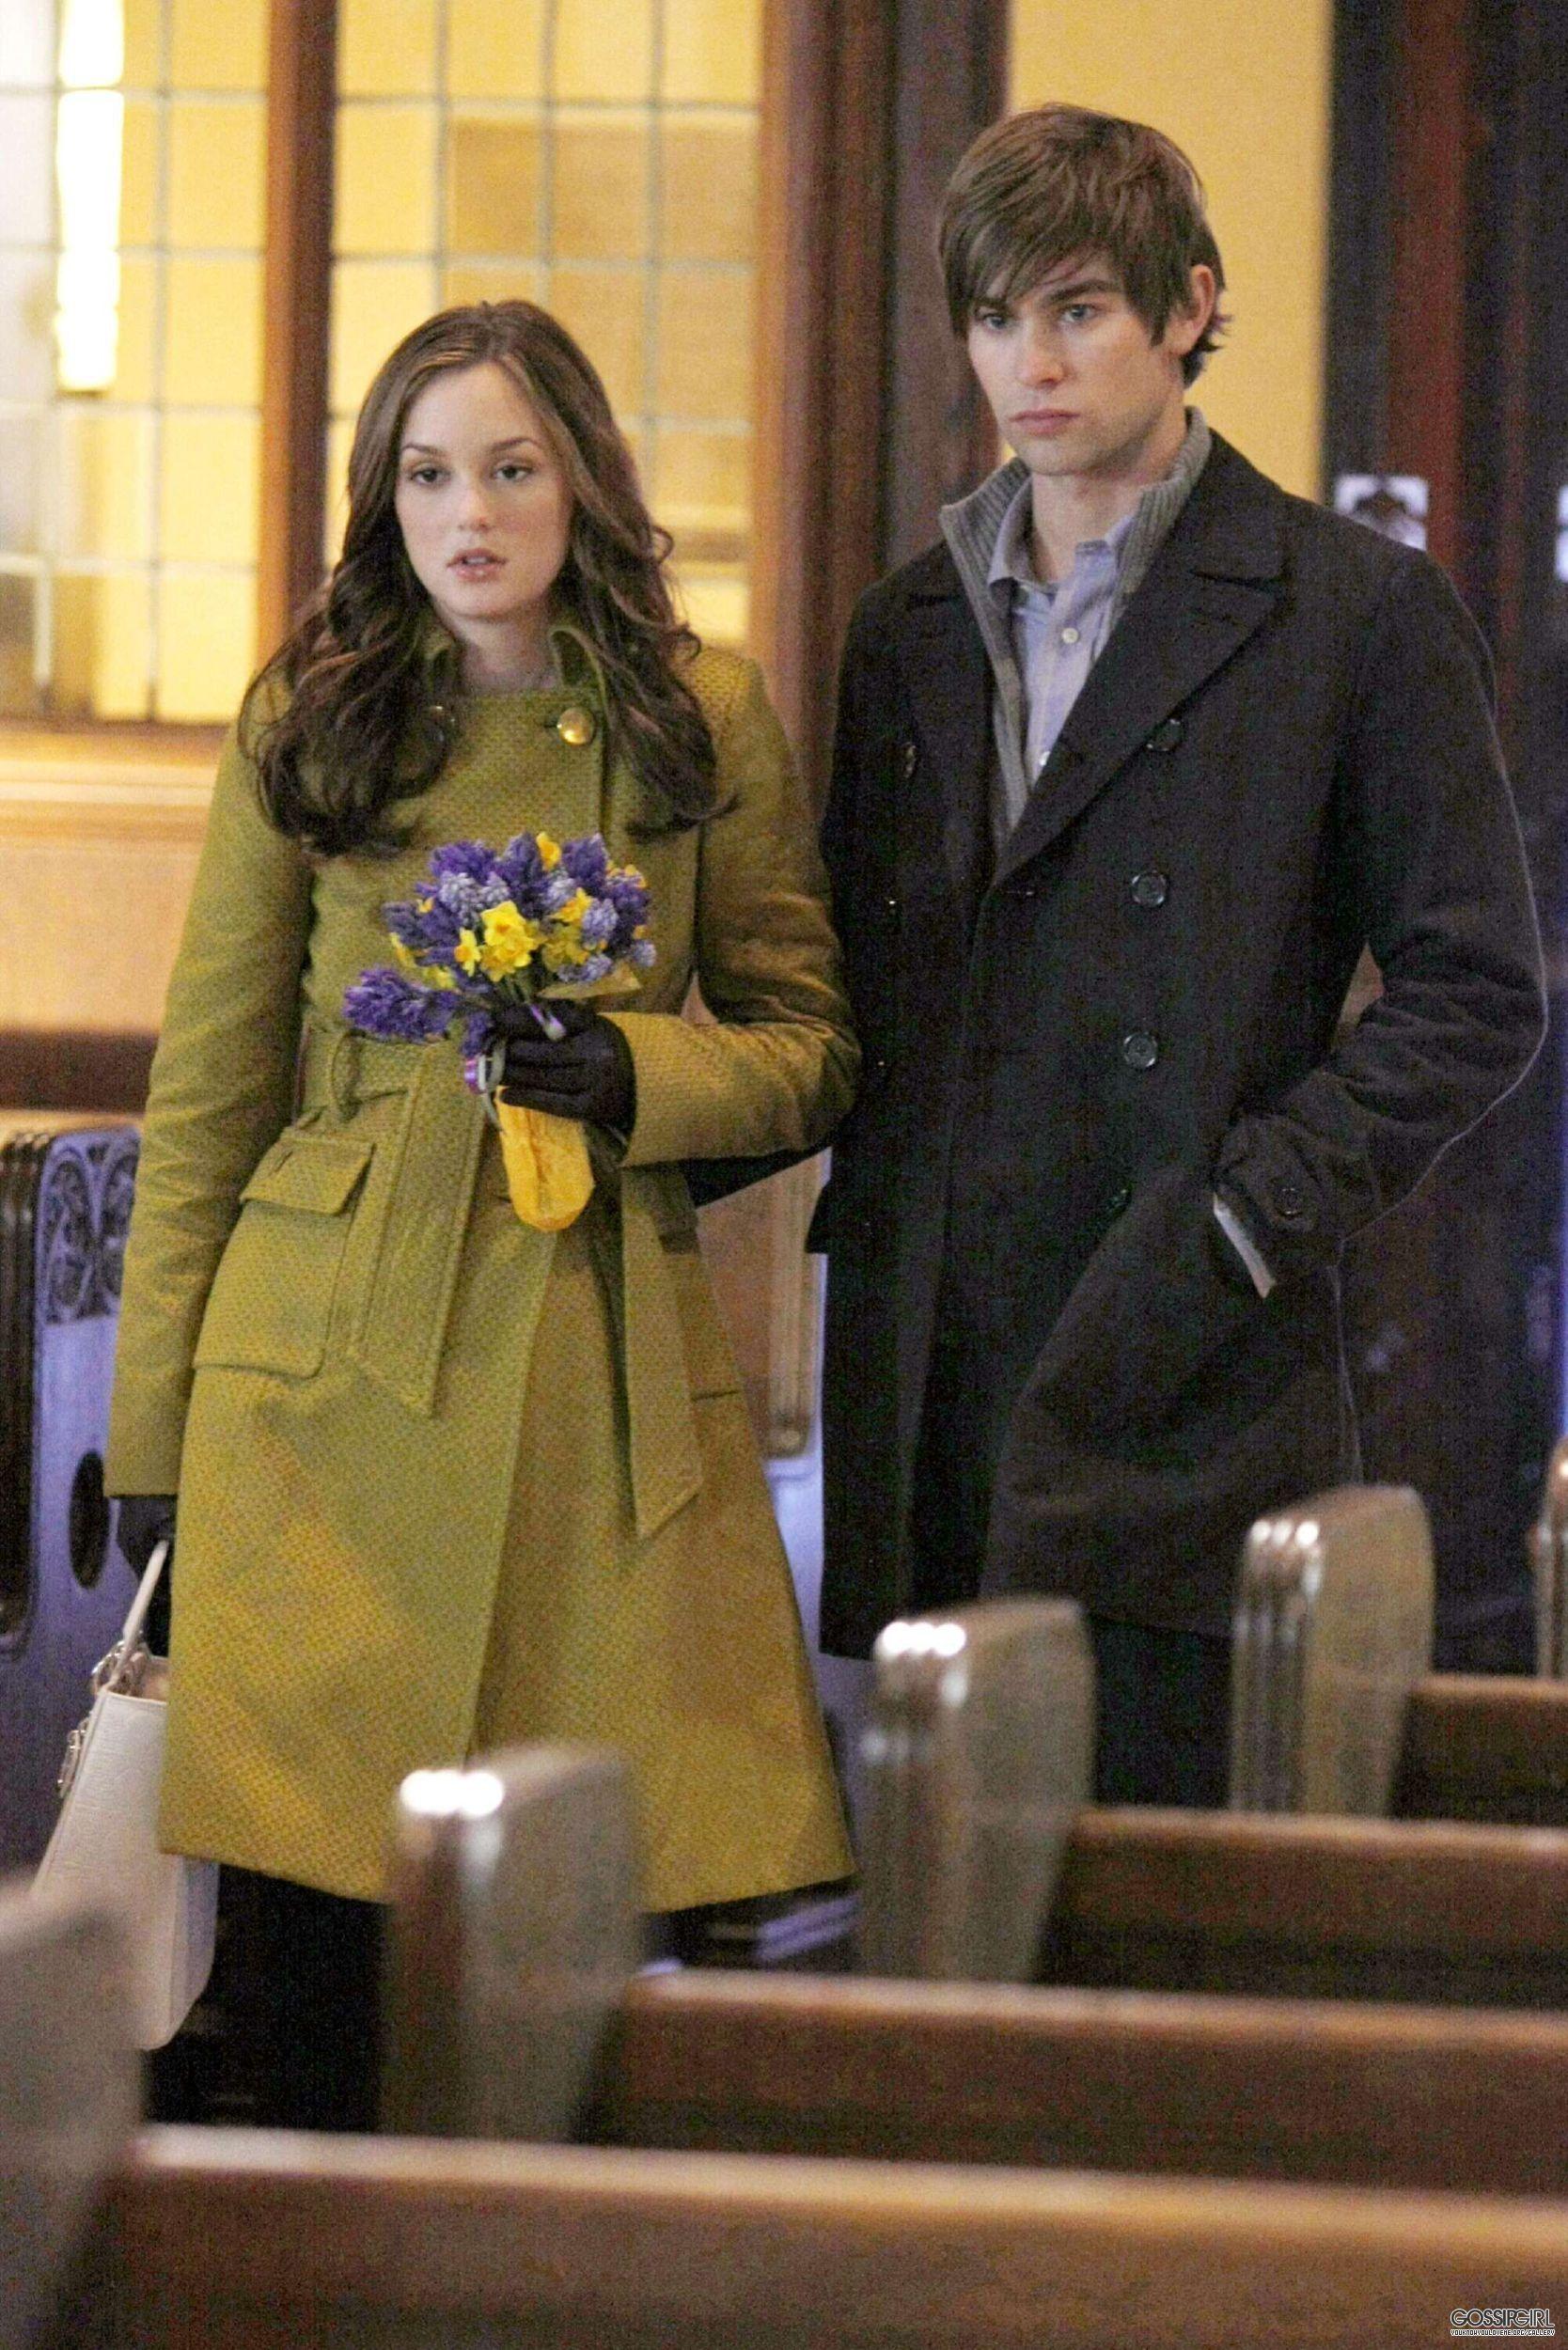 Gossip Girl Season 2. Blair Waldorf, Nate Archibald.